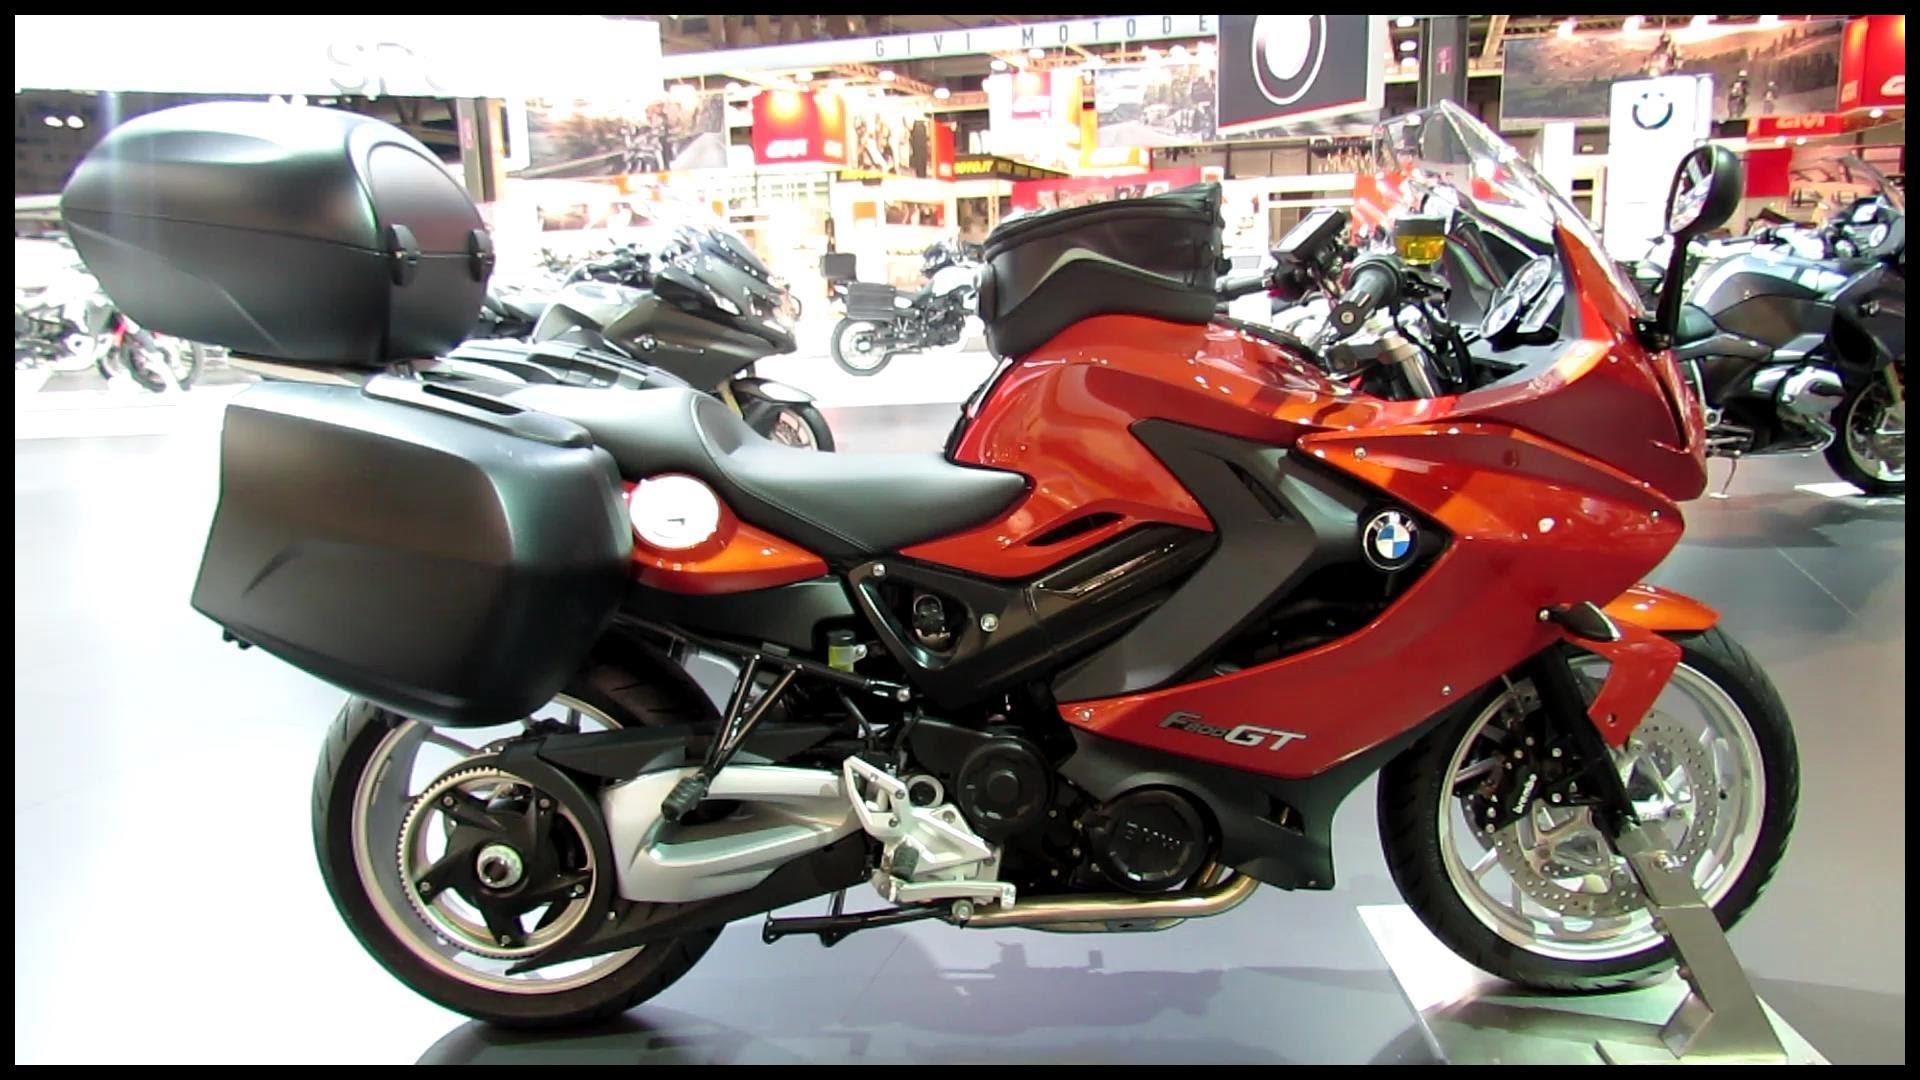 2014 BMW F800GT Accessoire Walkaround 2013 EICMA Milano Motorcycle Exhibition